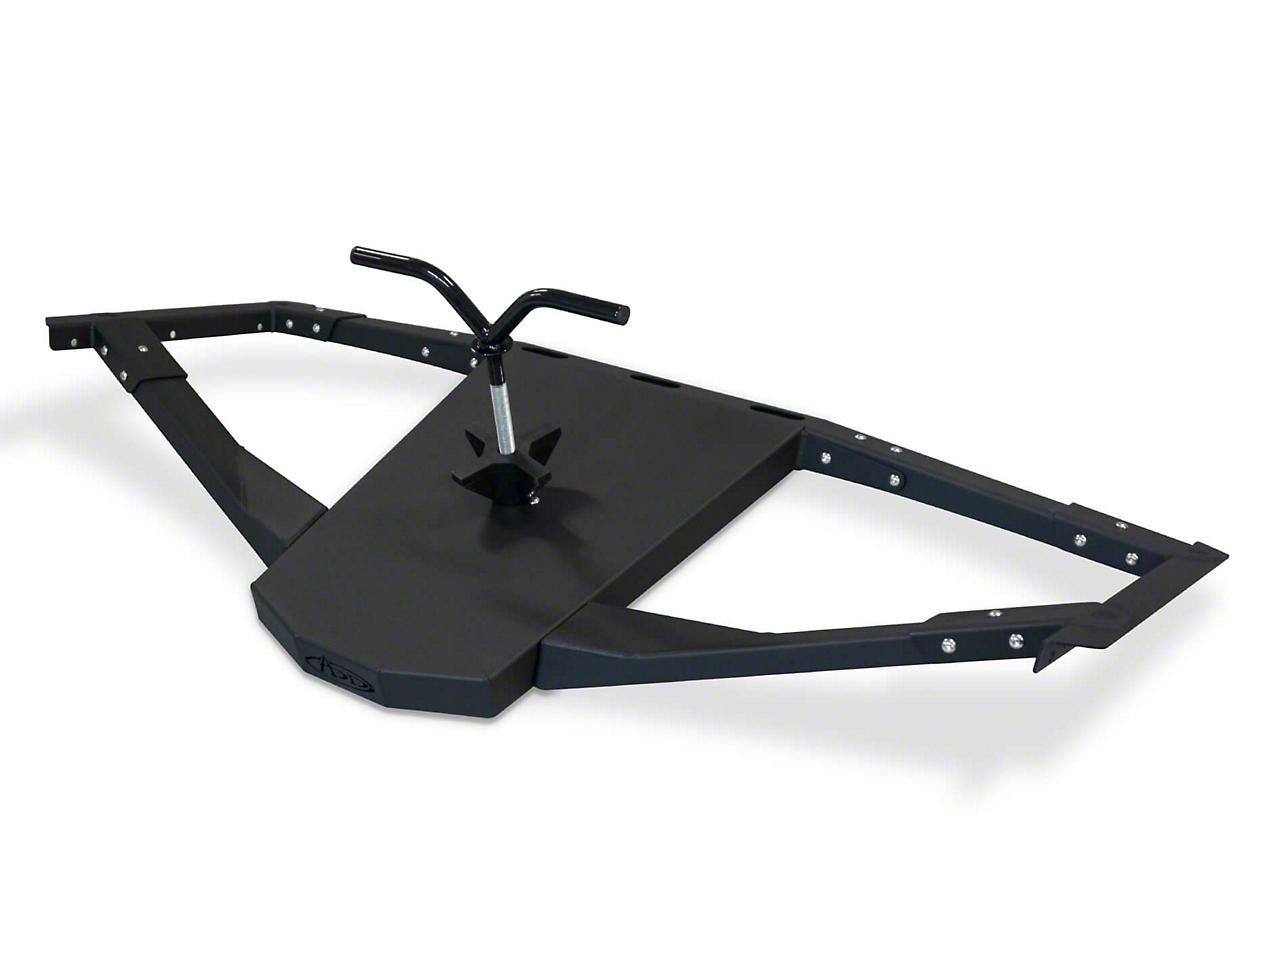 Addictive Desert Designs HoneyBadger Chase Rack Tire Carrier (17-18 Raptor)